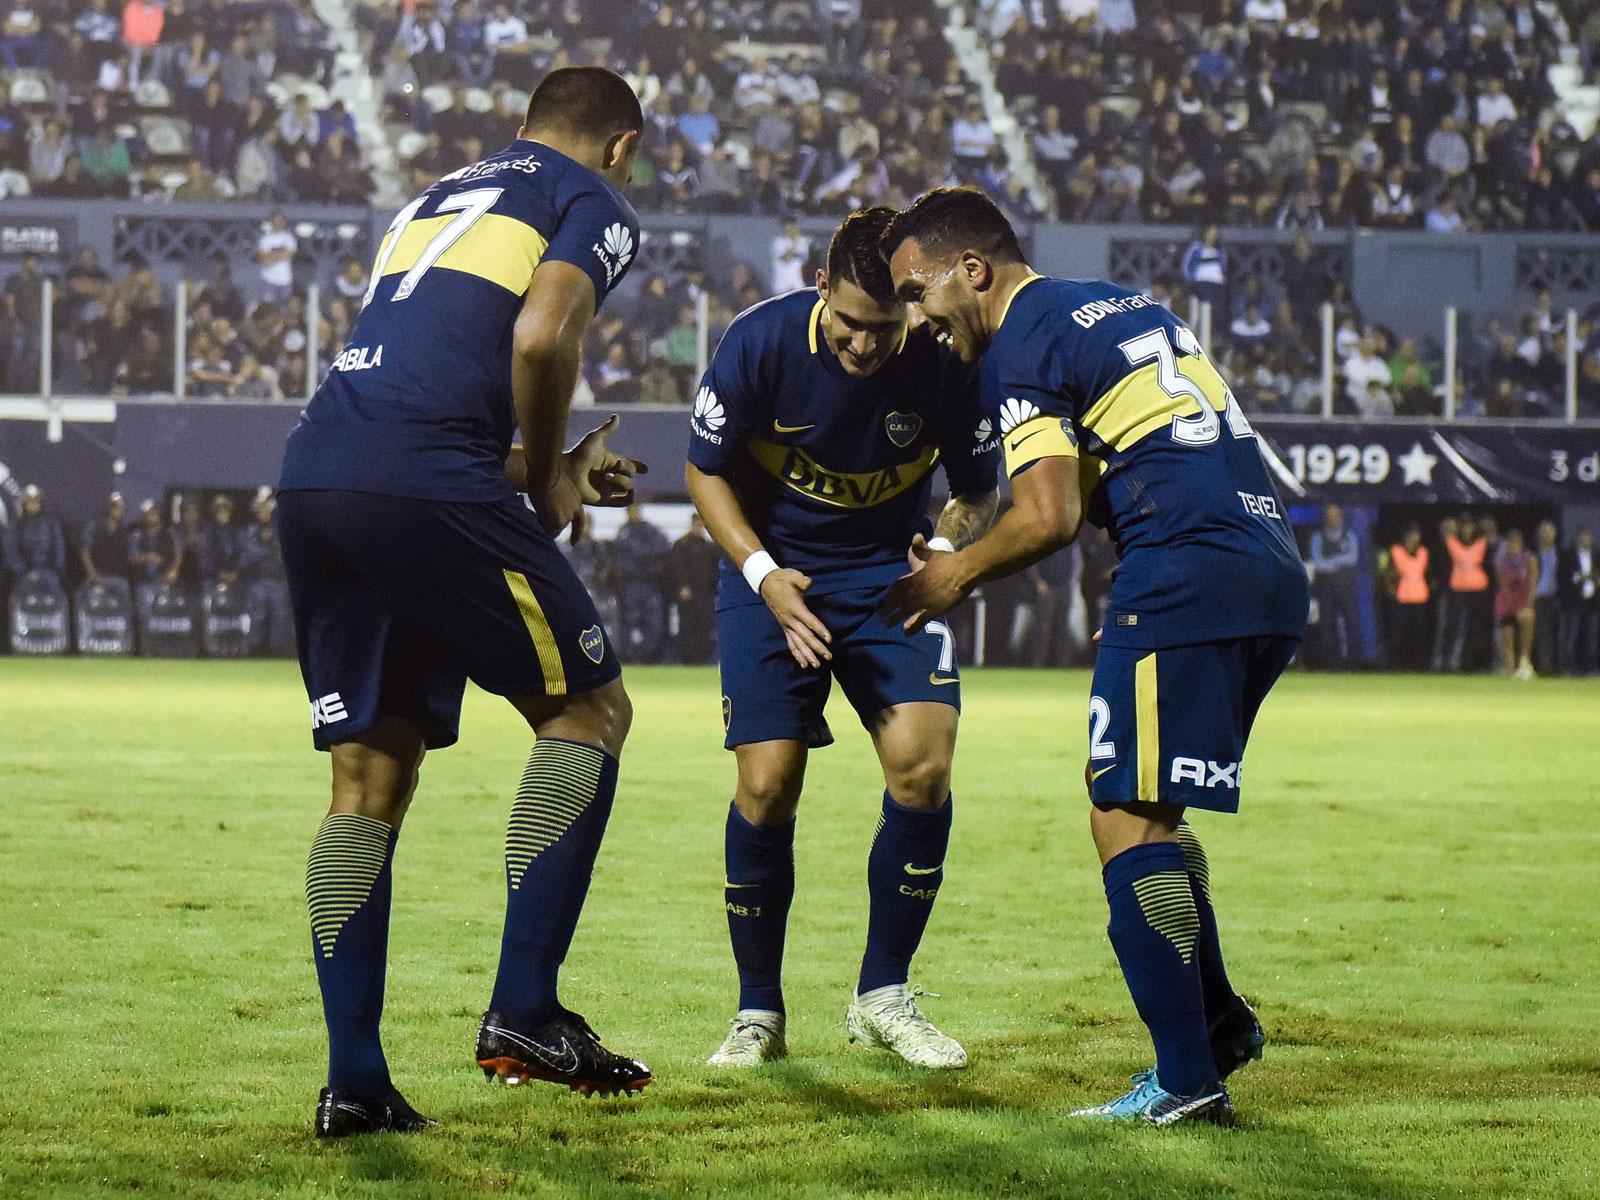 Carlos Tevez is back with Boca Juniors